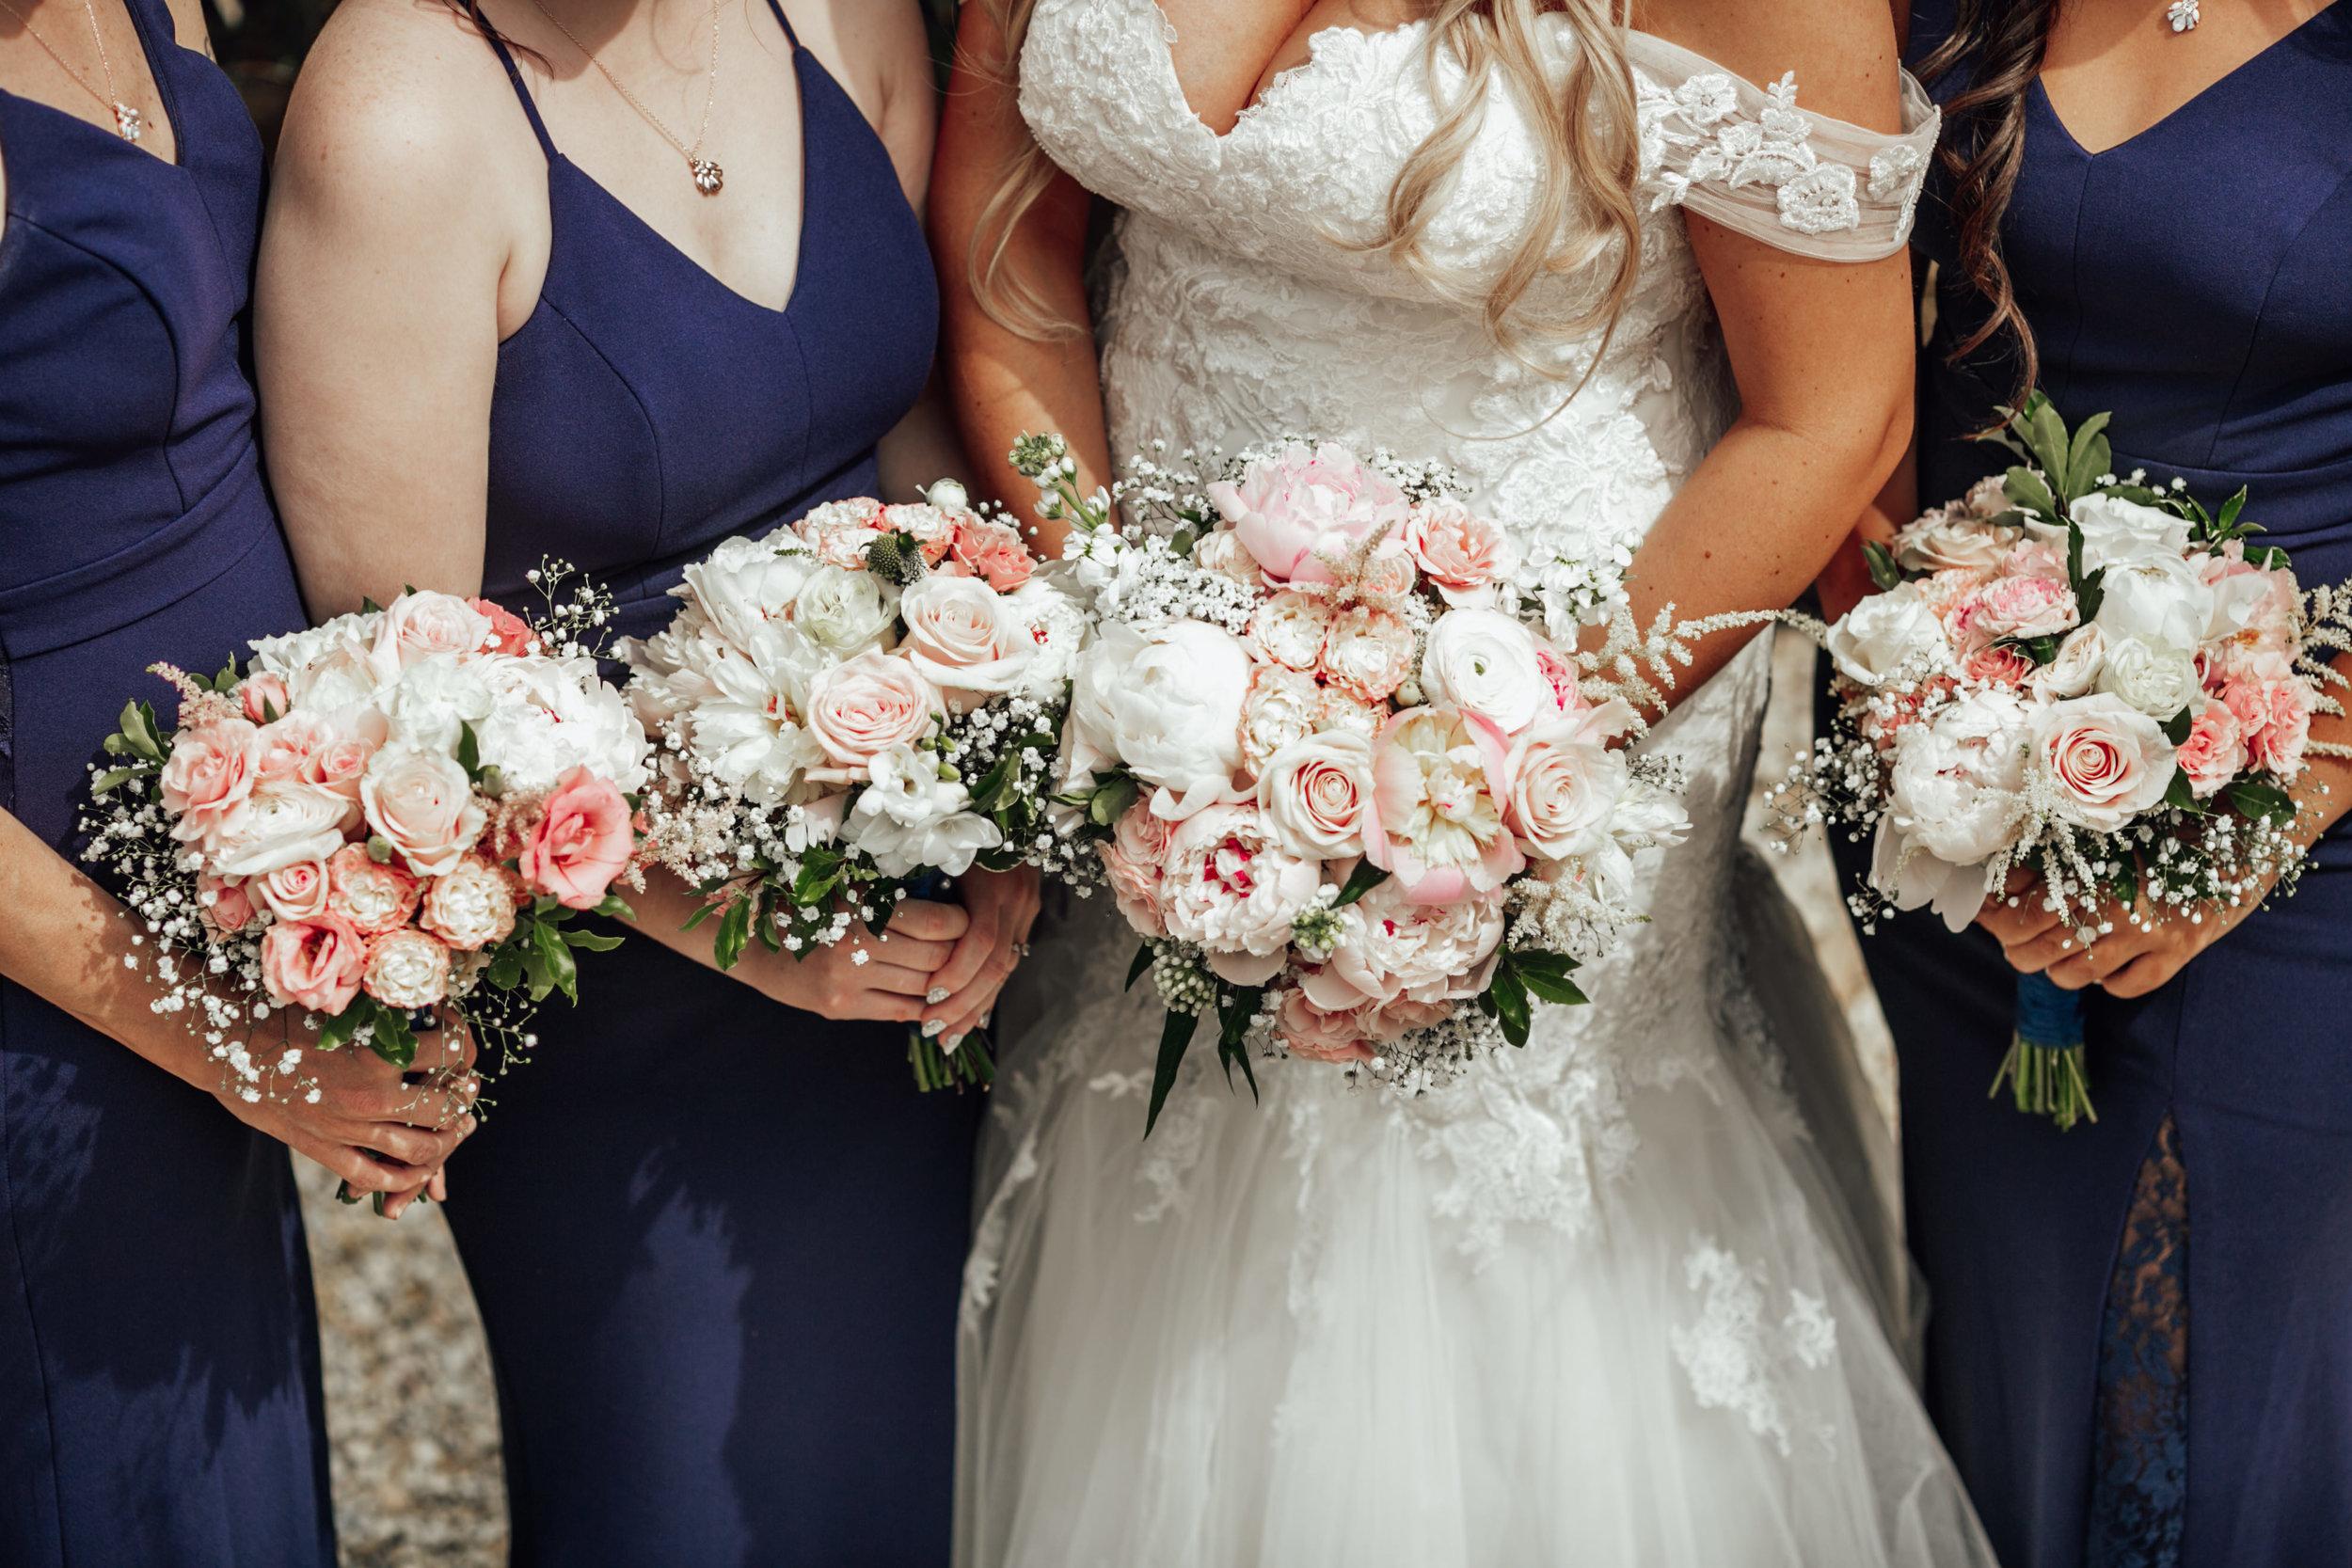 New Jersey Wedding Photographer, Felsberg Photography LBI wedding photography 53.jpg